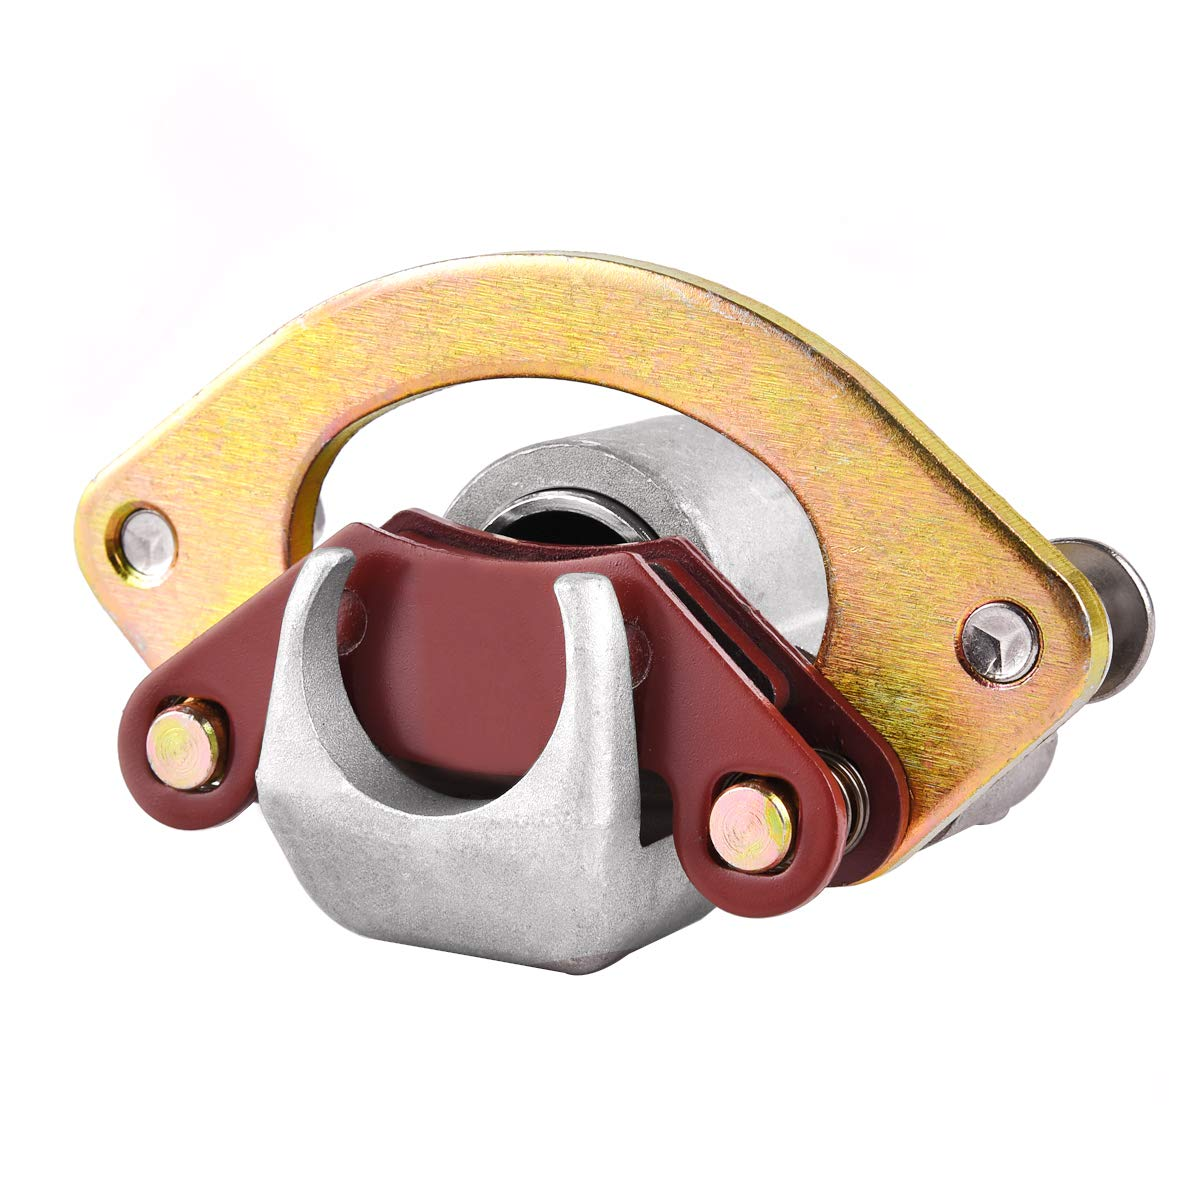 RUHUO Front Left Brake Caliper for Polaris Sportsman 550 850 1000 Scrambler Replaces 1911150